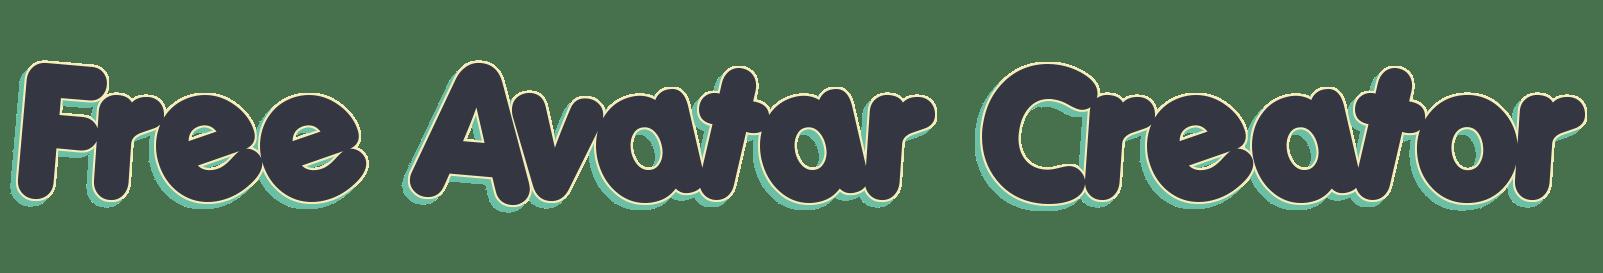 Free-Avatar-Creator